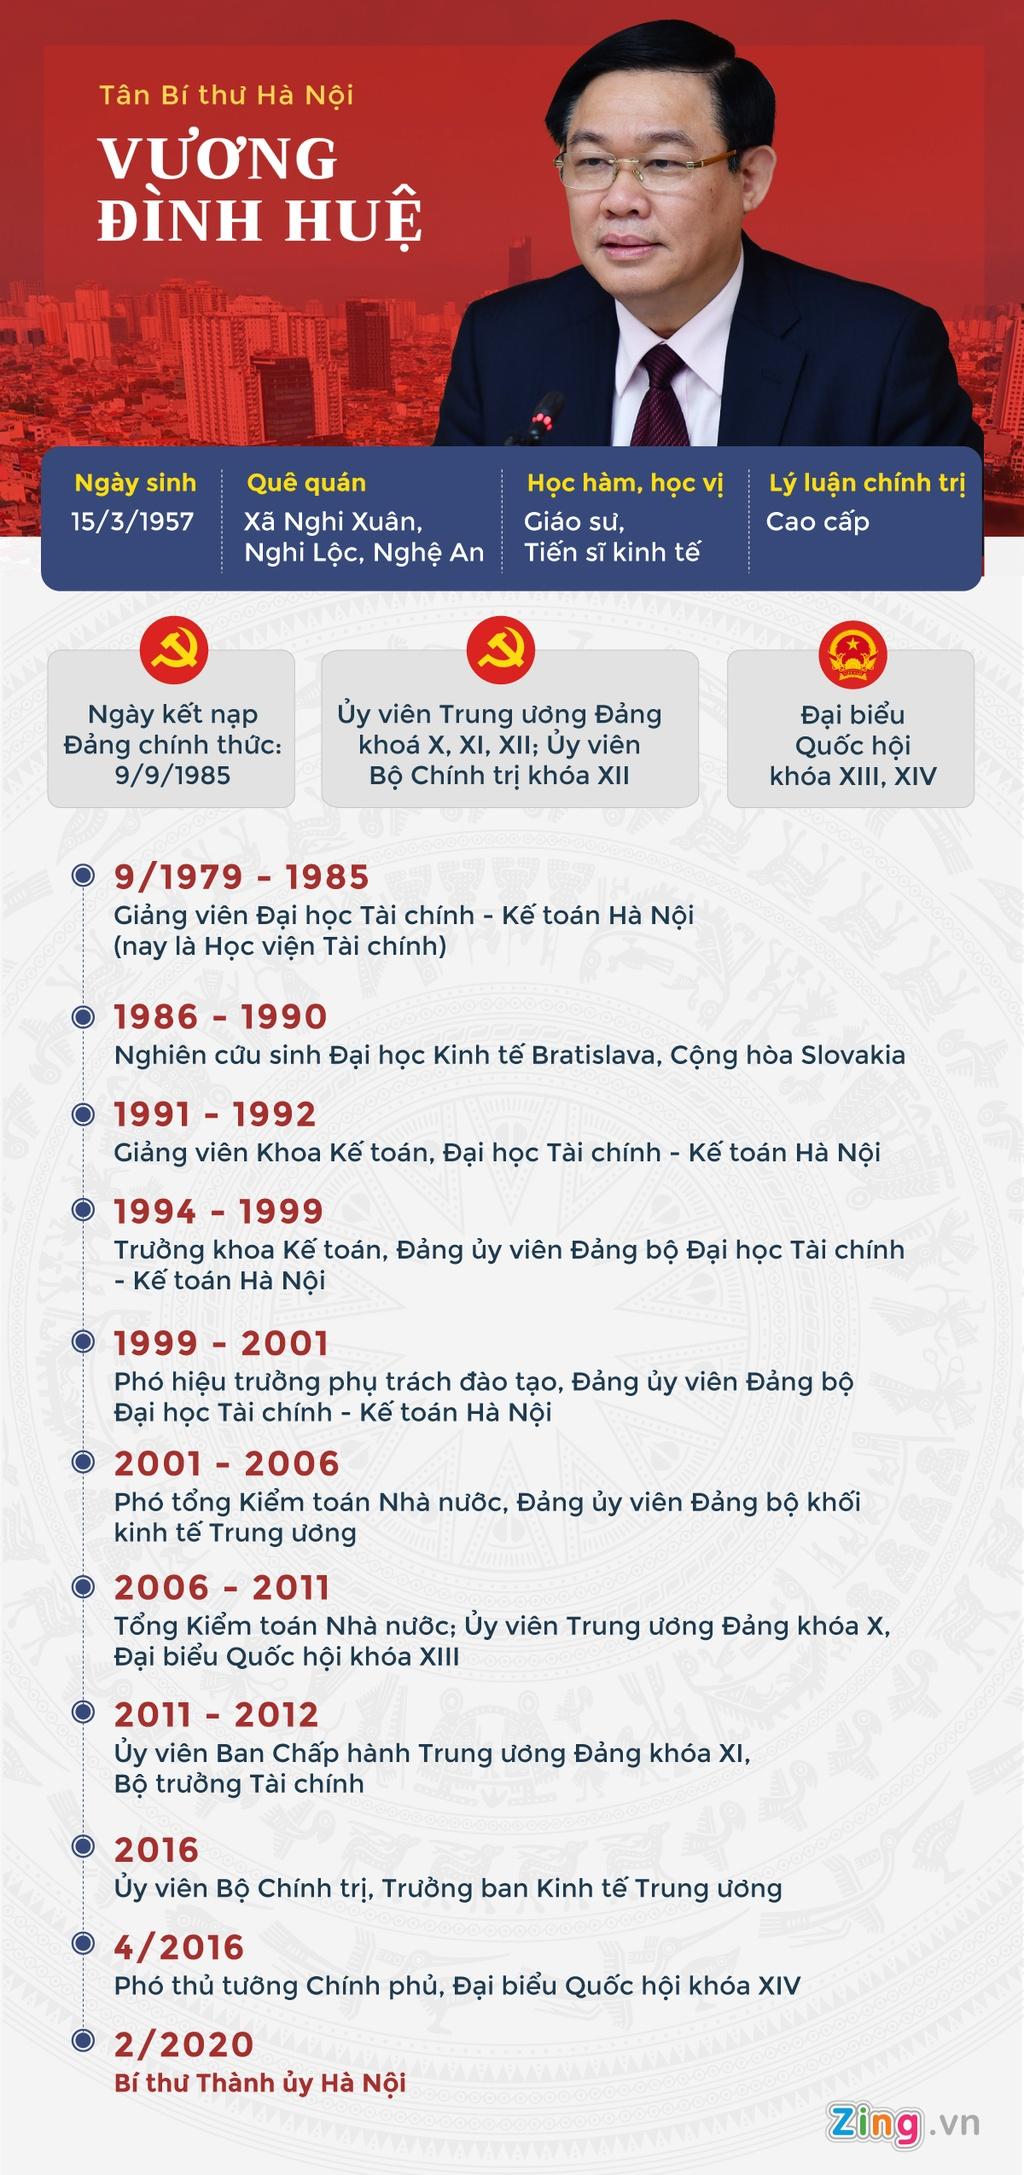 Ong Vuong Dinh Hue: Tu giang vien dai hoc den Bi thu Ha Noi hinh anh 1 TT_Vuong_Dinh_Hue_1_.jpg